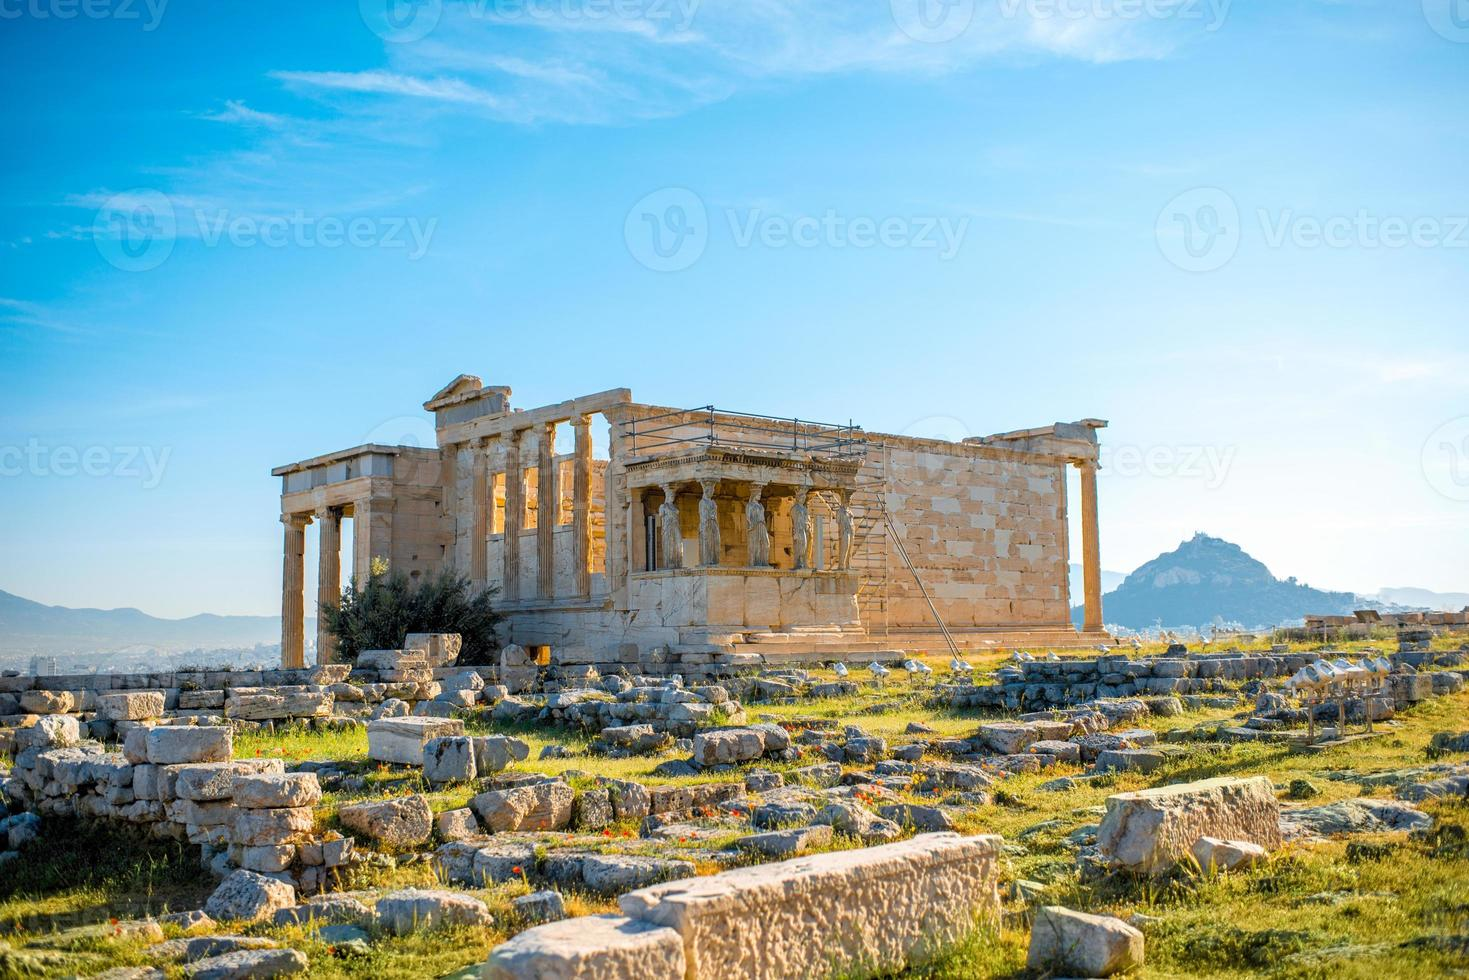 Erechtheum temple in Acropolis photo